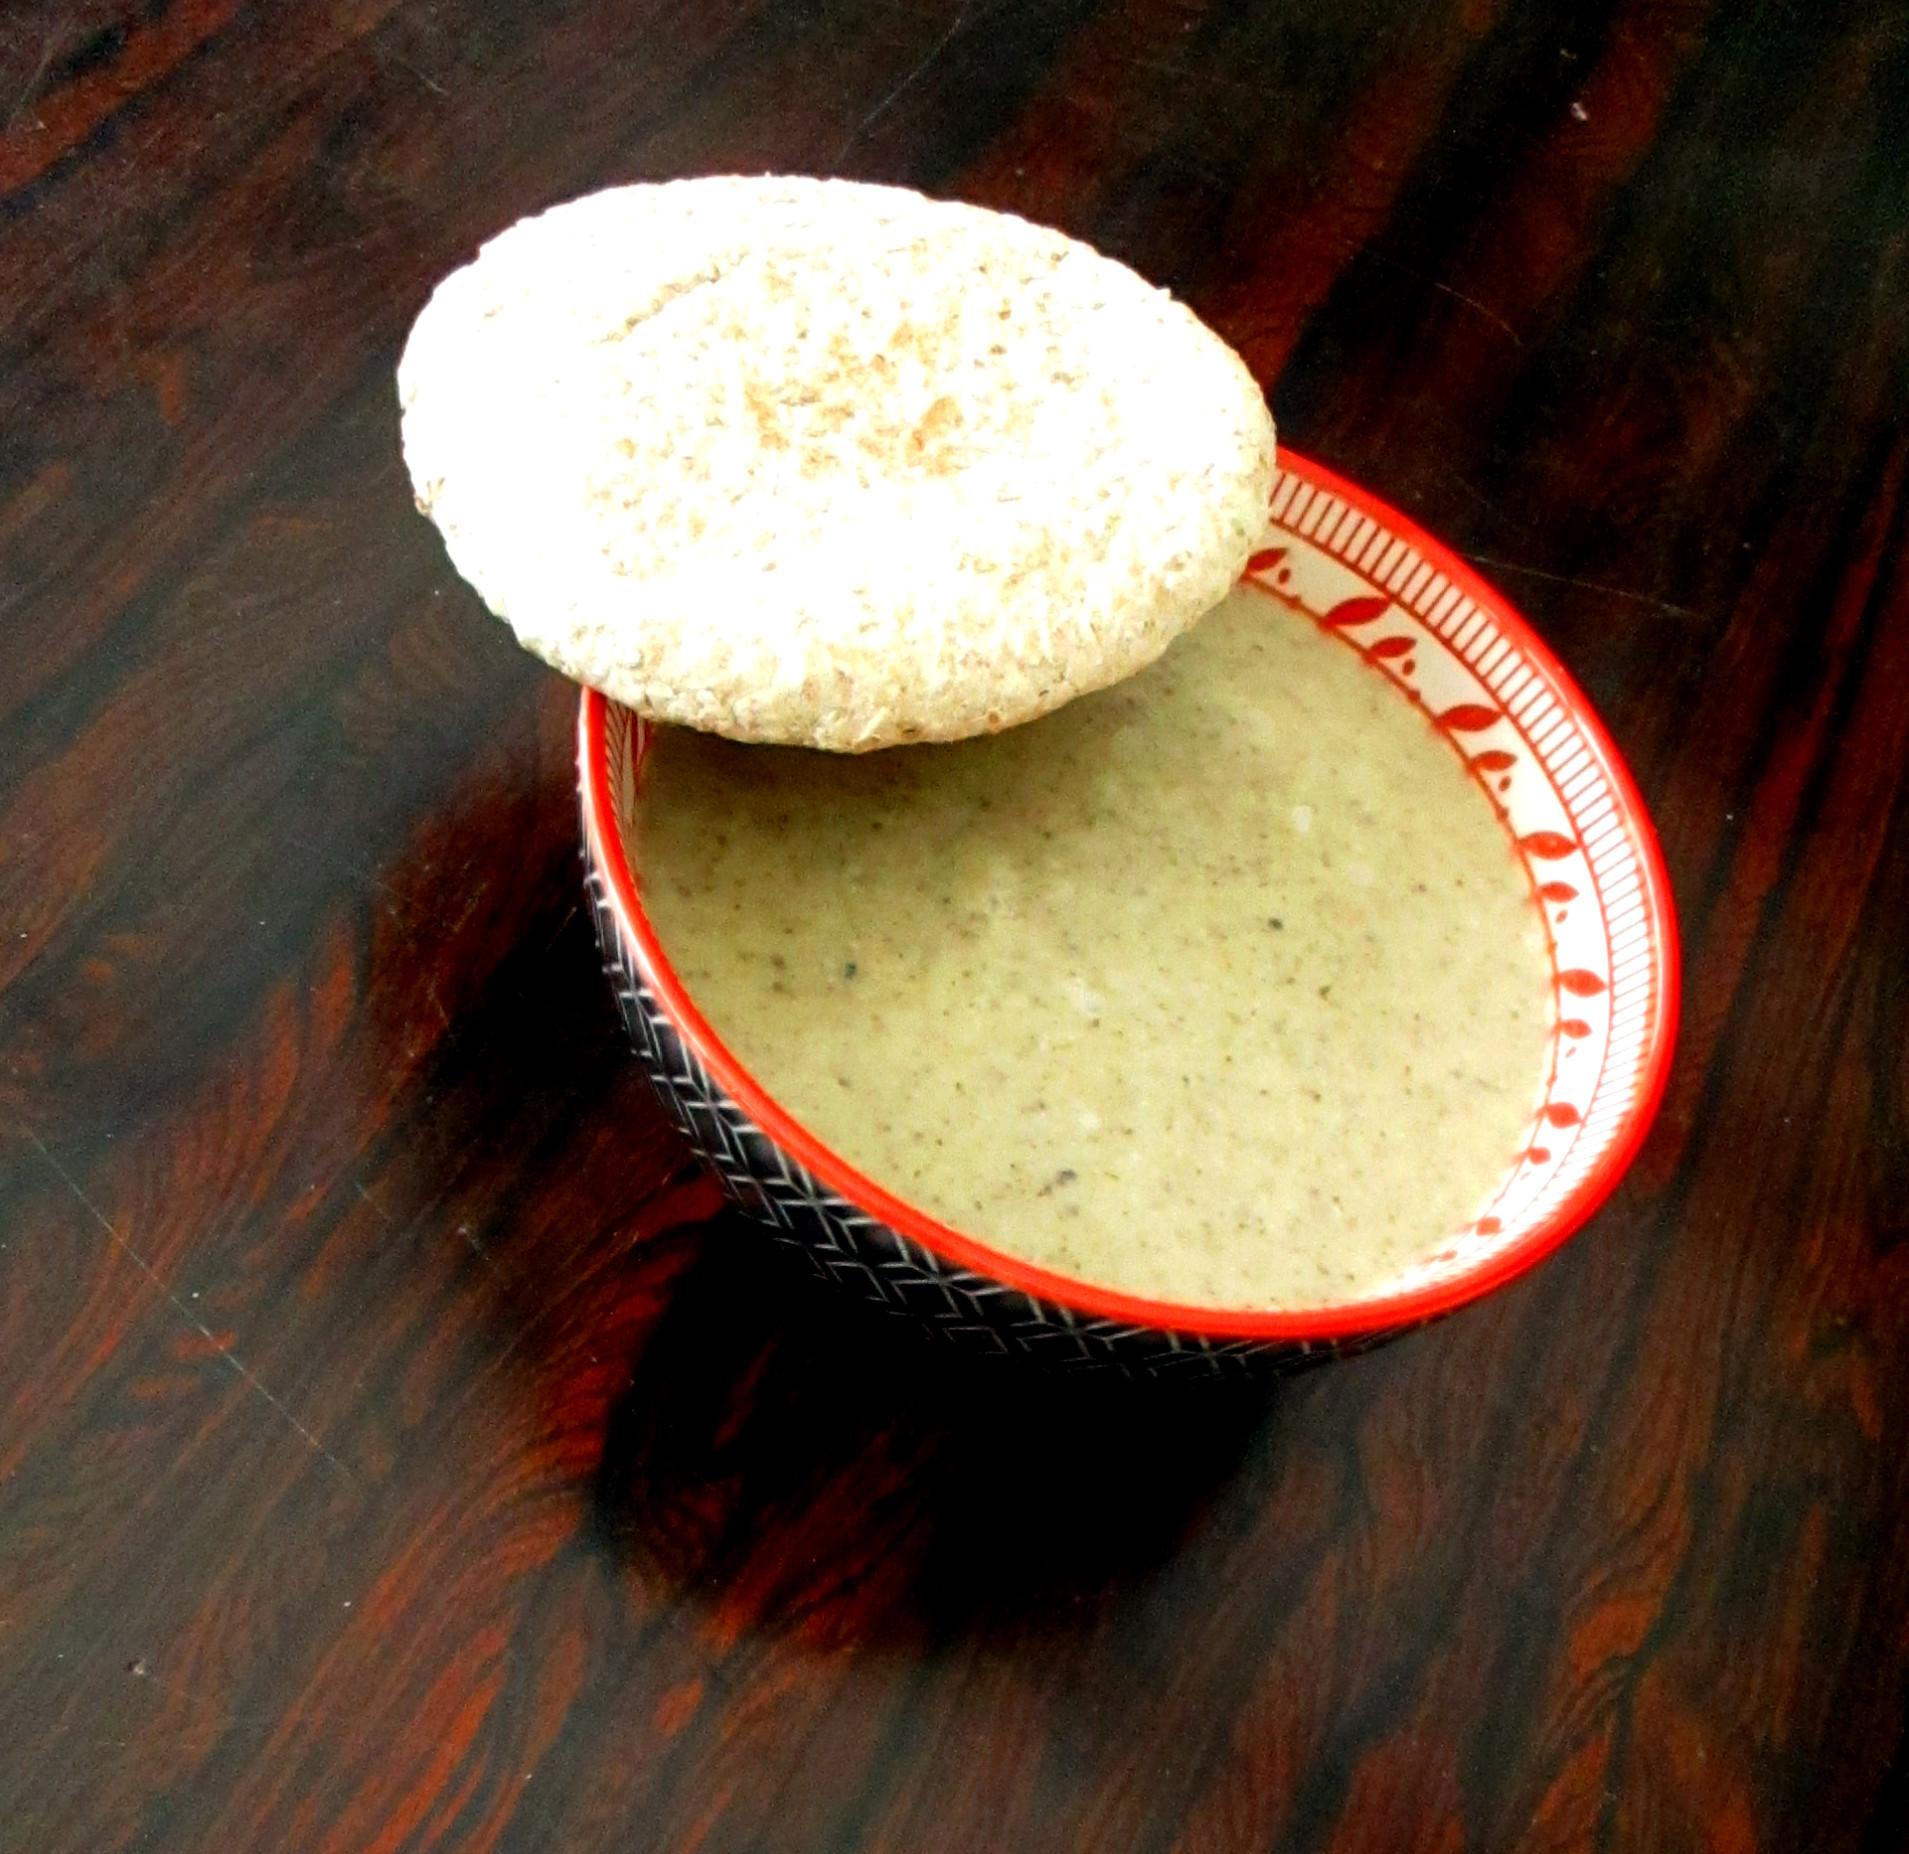 vegan veganistische champignonsoep romig creamy glutenvrij lactosevrij sojavrij